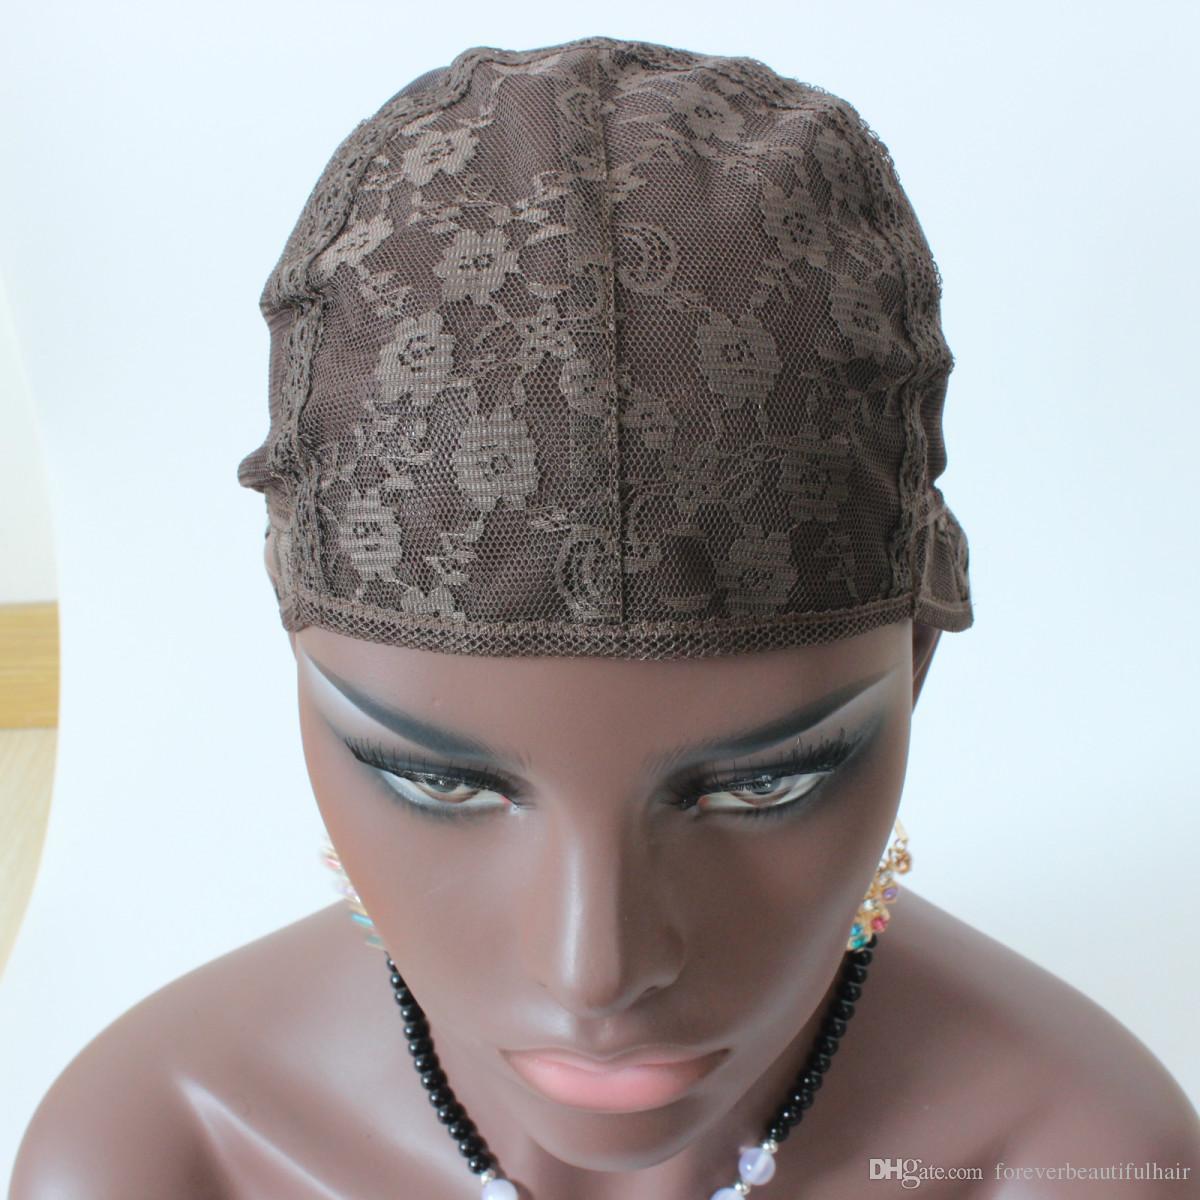 3pcs Jewish Wig Cap Brown Color S / M / L Glufteless Wig Caps för att göra peruker Stretch Lace Weaving Cap Justerbara band Medium Brown